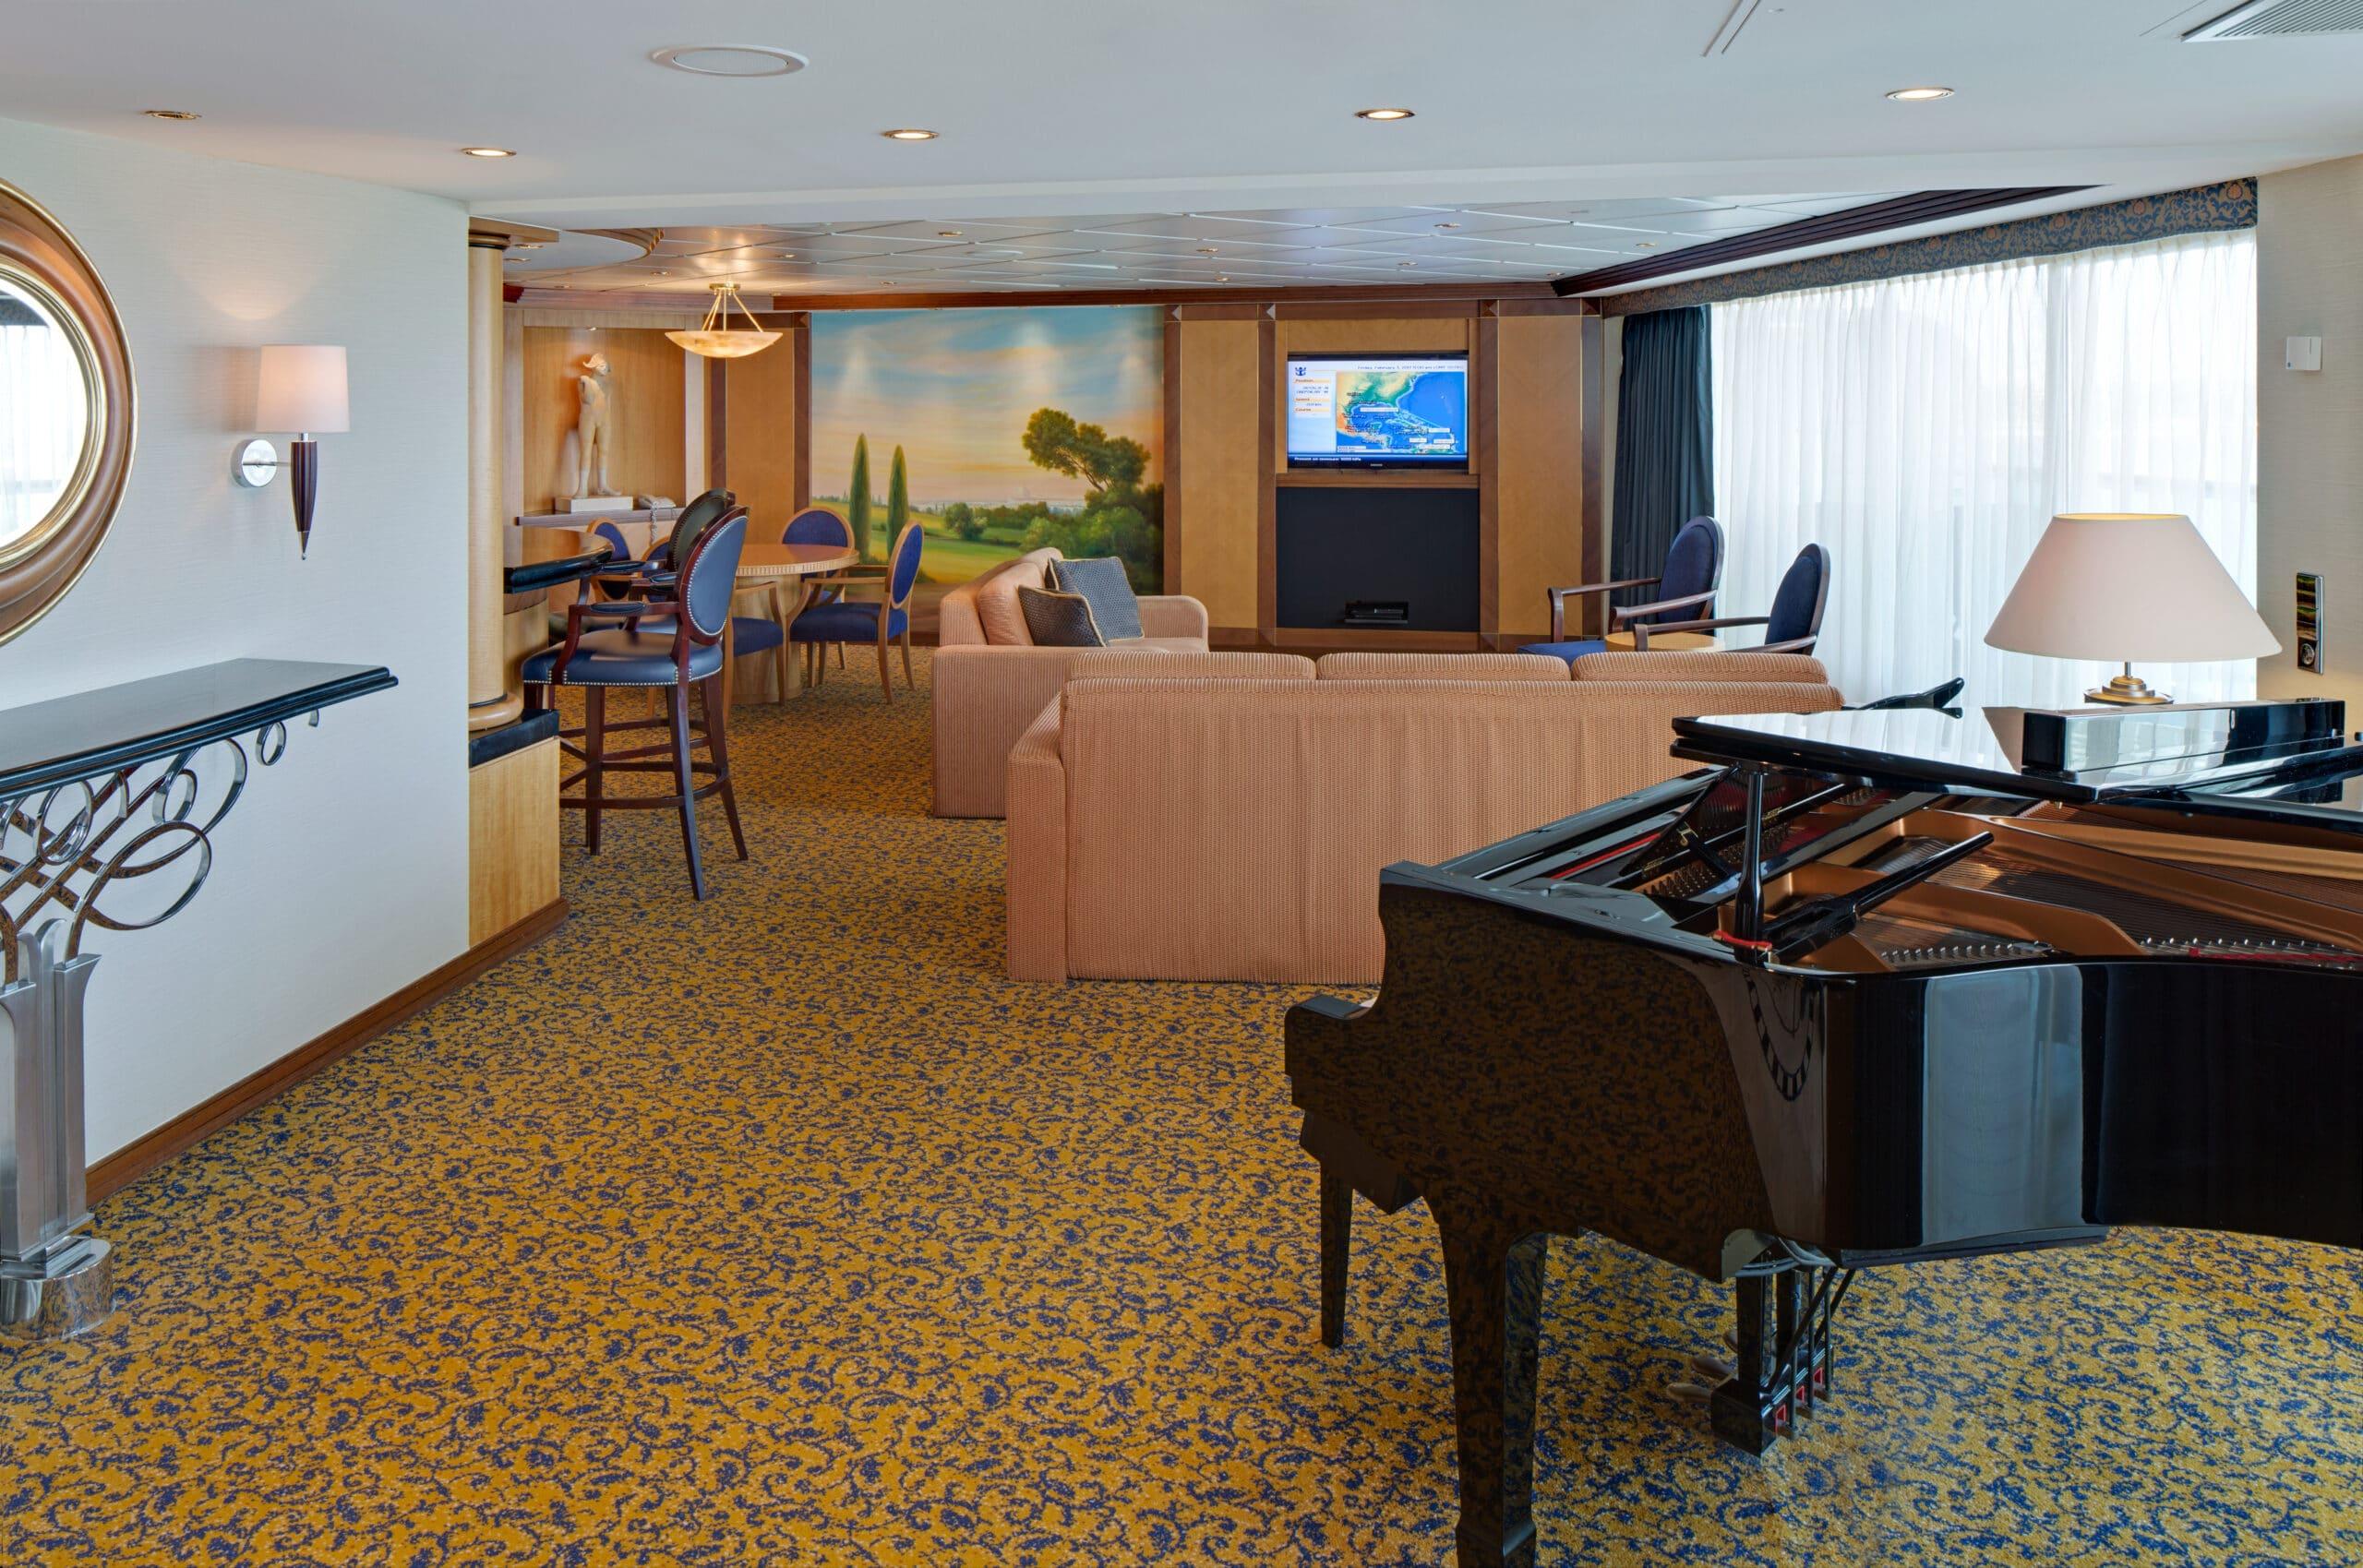 Royal-Caribbean-International-Serenade-of-the-Seas-schip-cruiseschip-categorie-RS-Royal-Suite